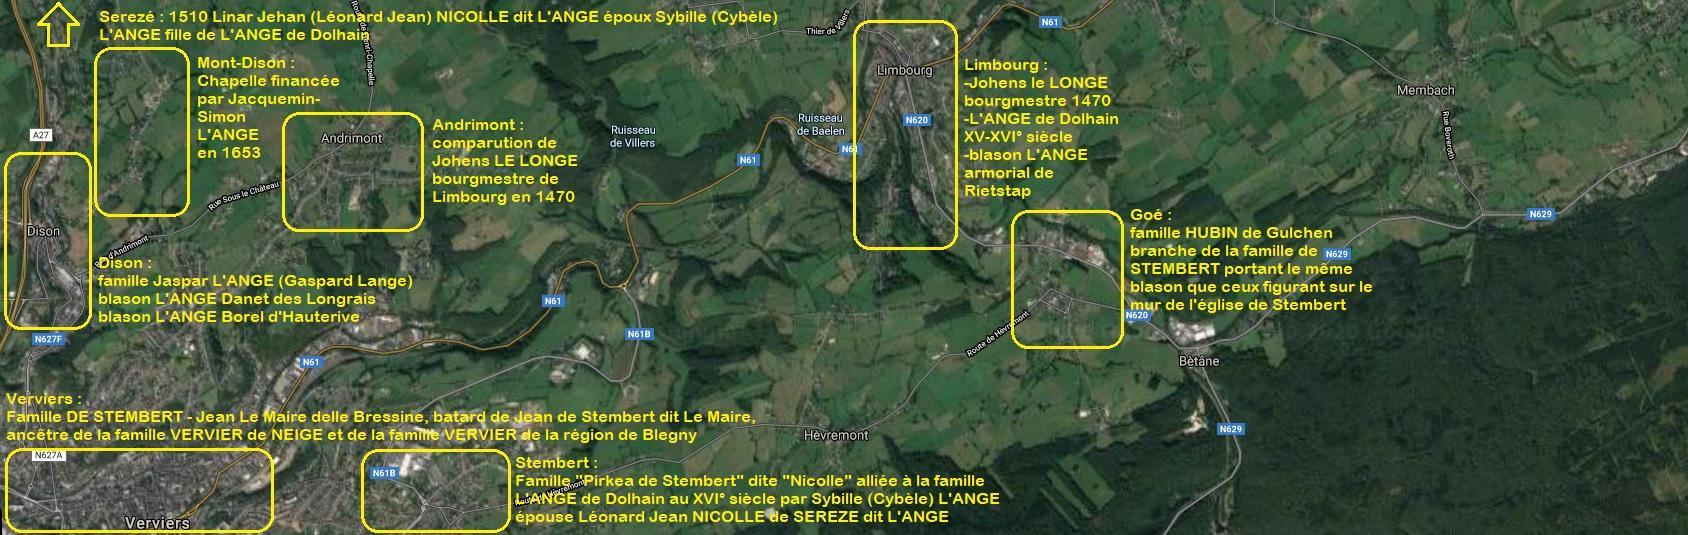 Limbourg carte satellite villages avoisinants